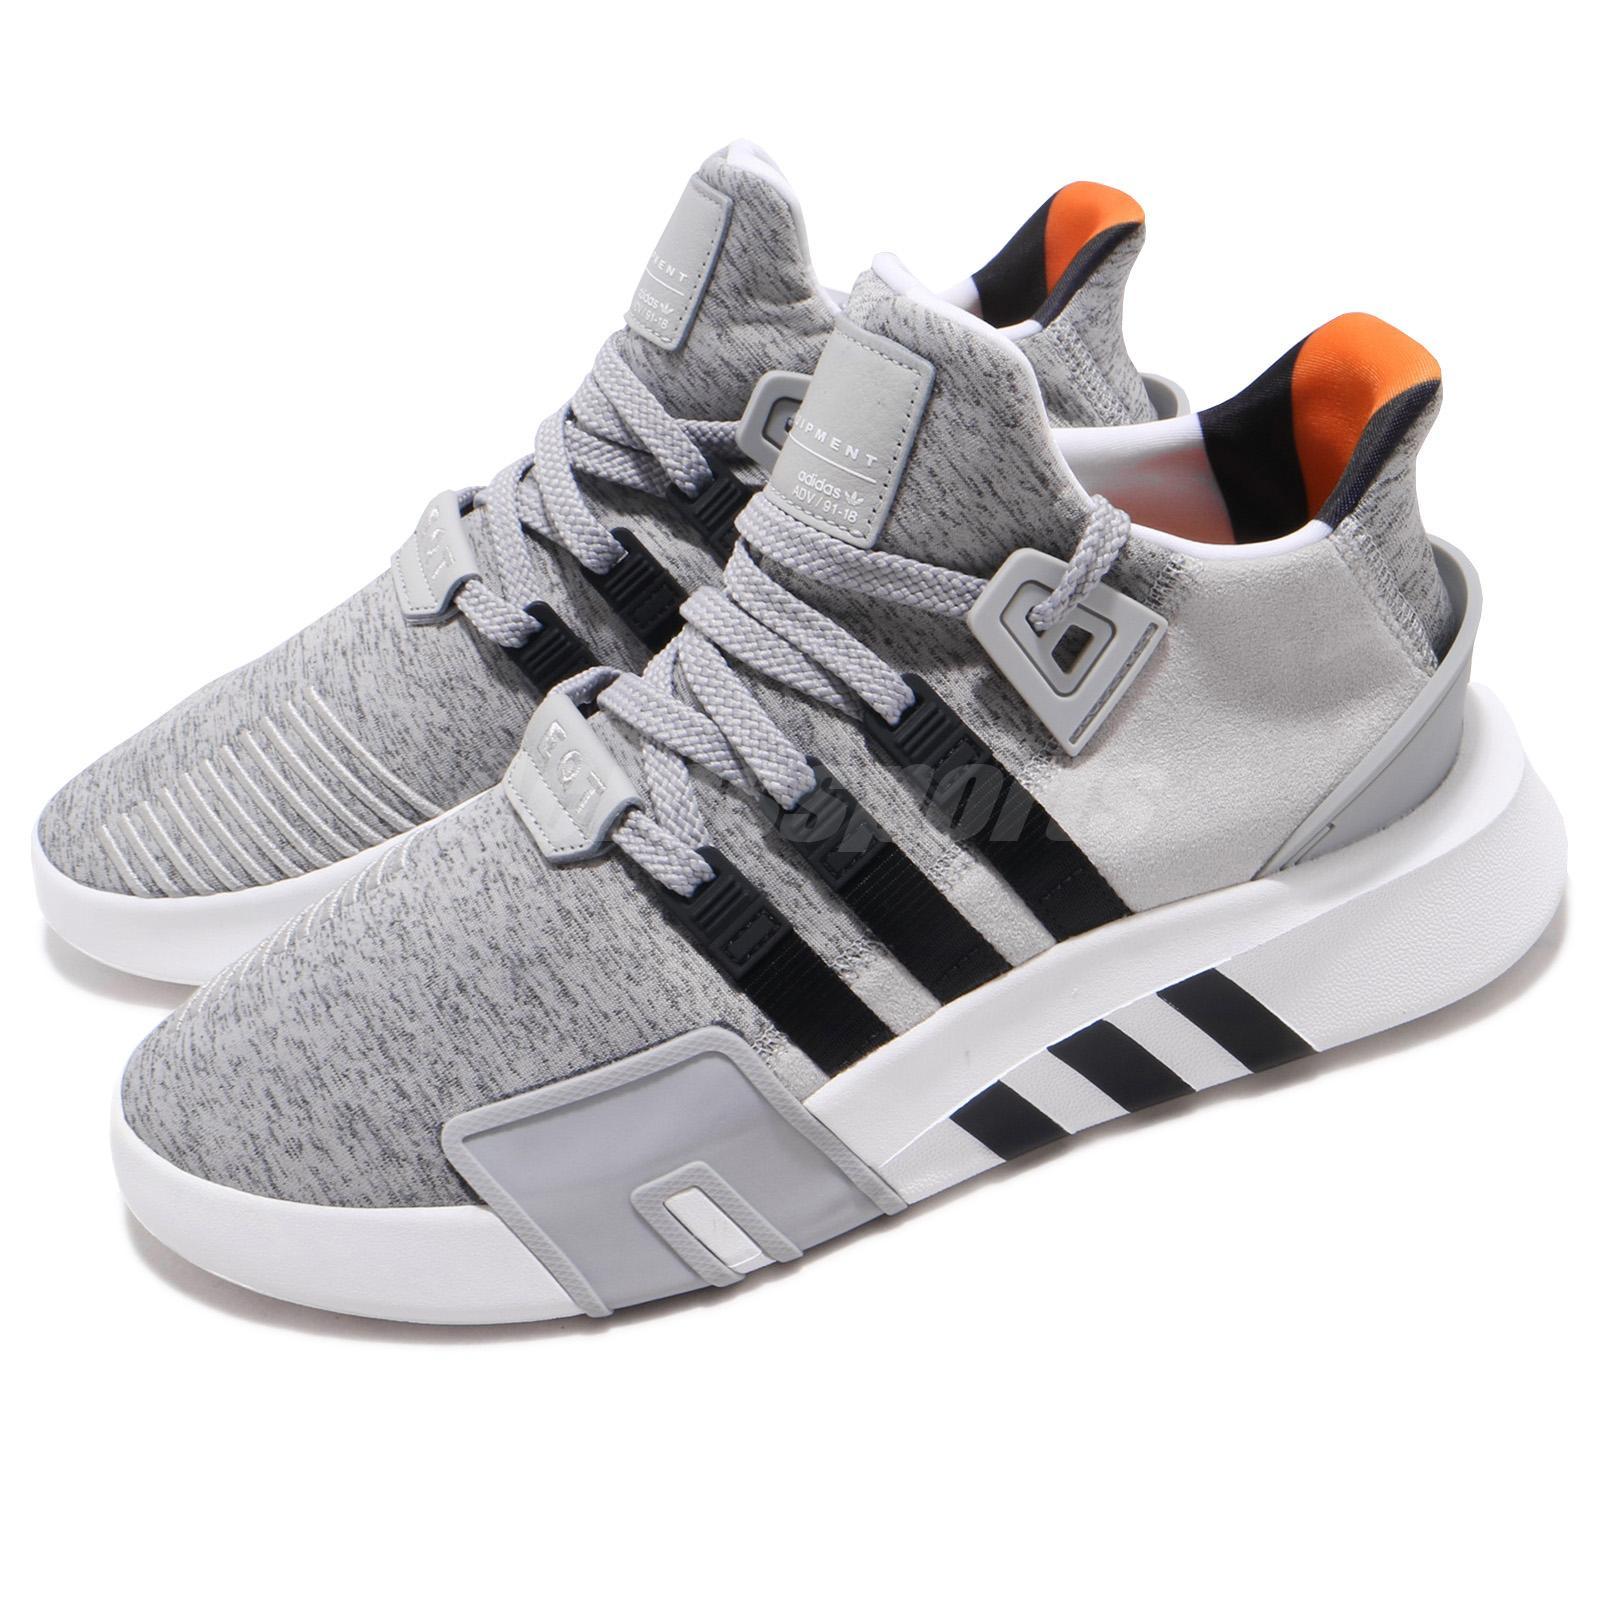 ef6cf8d30901 Details about adidas Originals EQT Bask ADV Grey Black White Men Running  Shoes Sneakers B37516